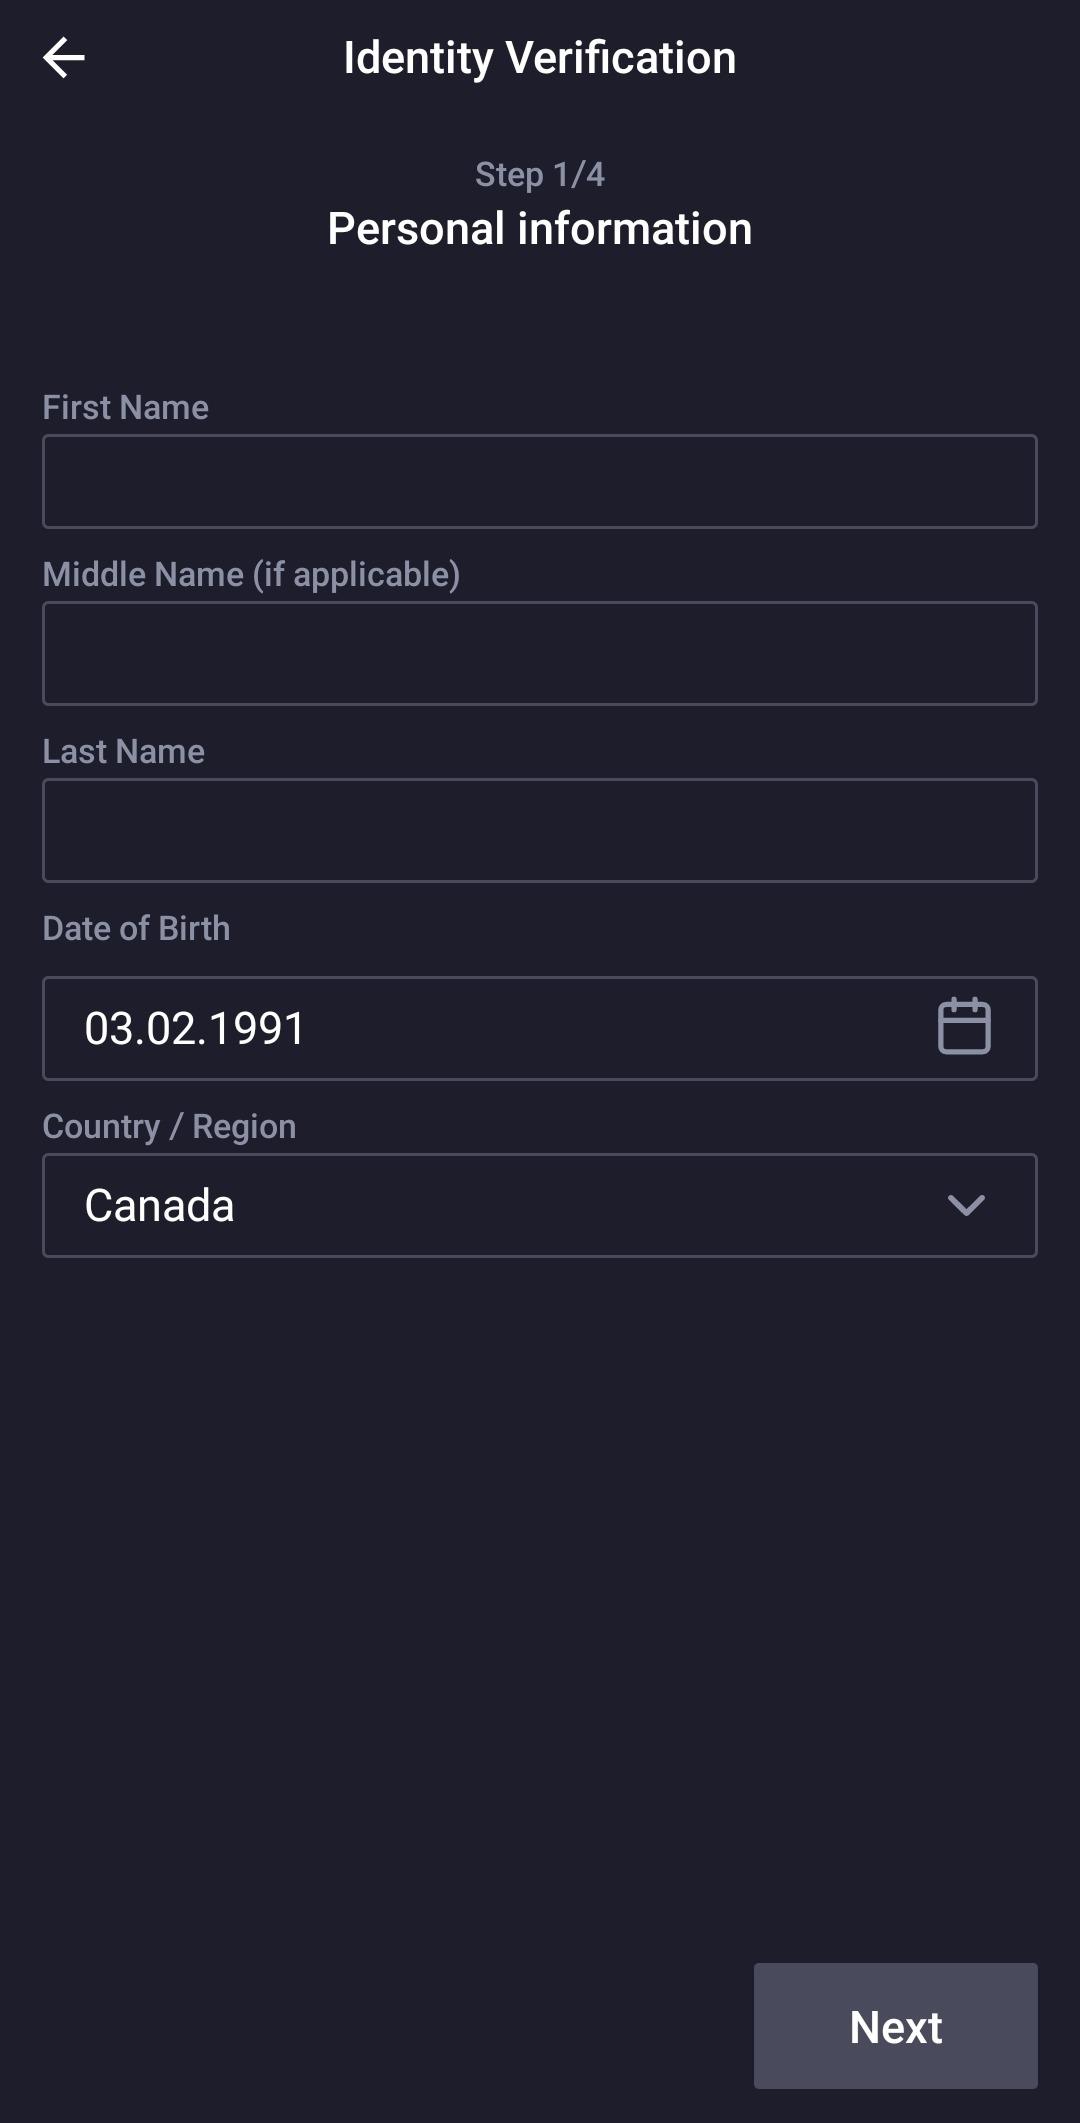 Identity verification 1 step